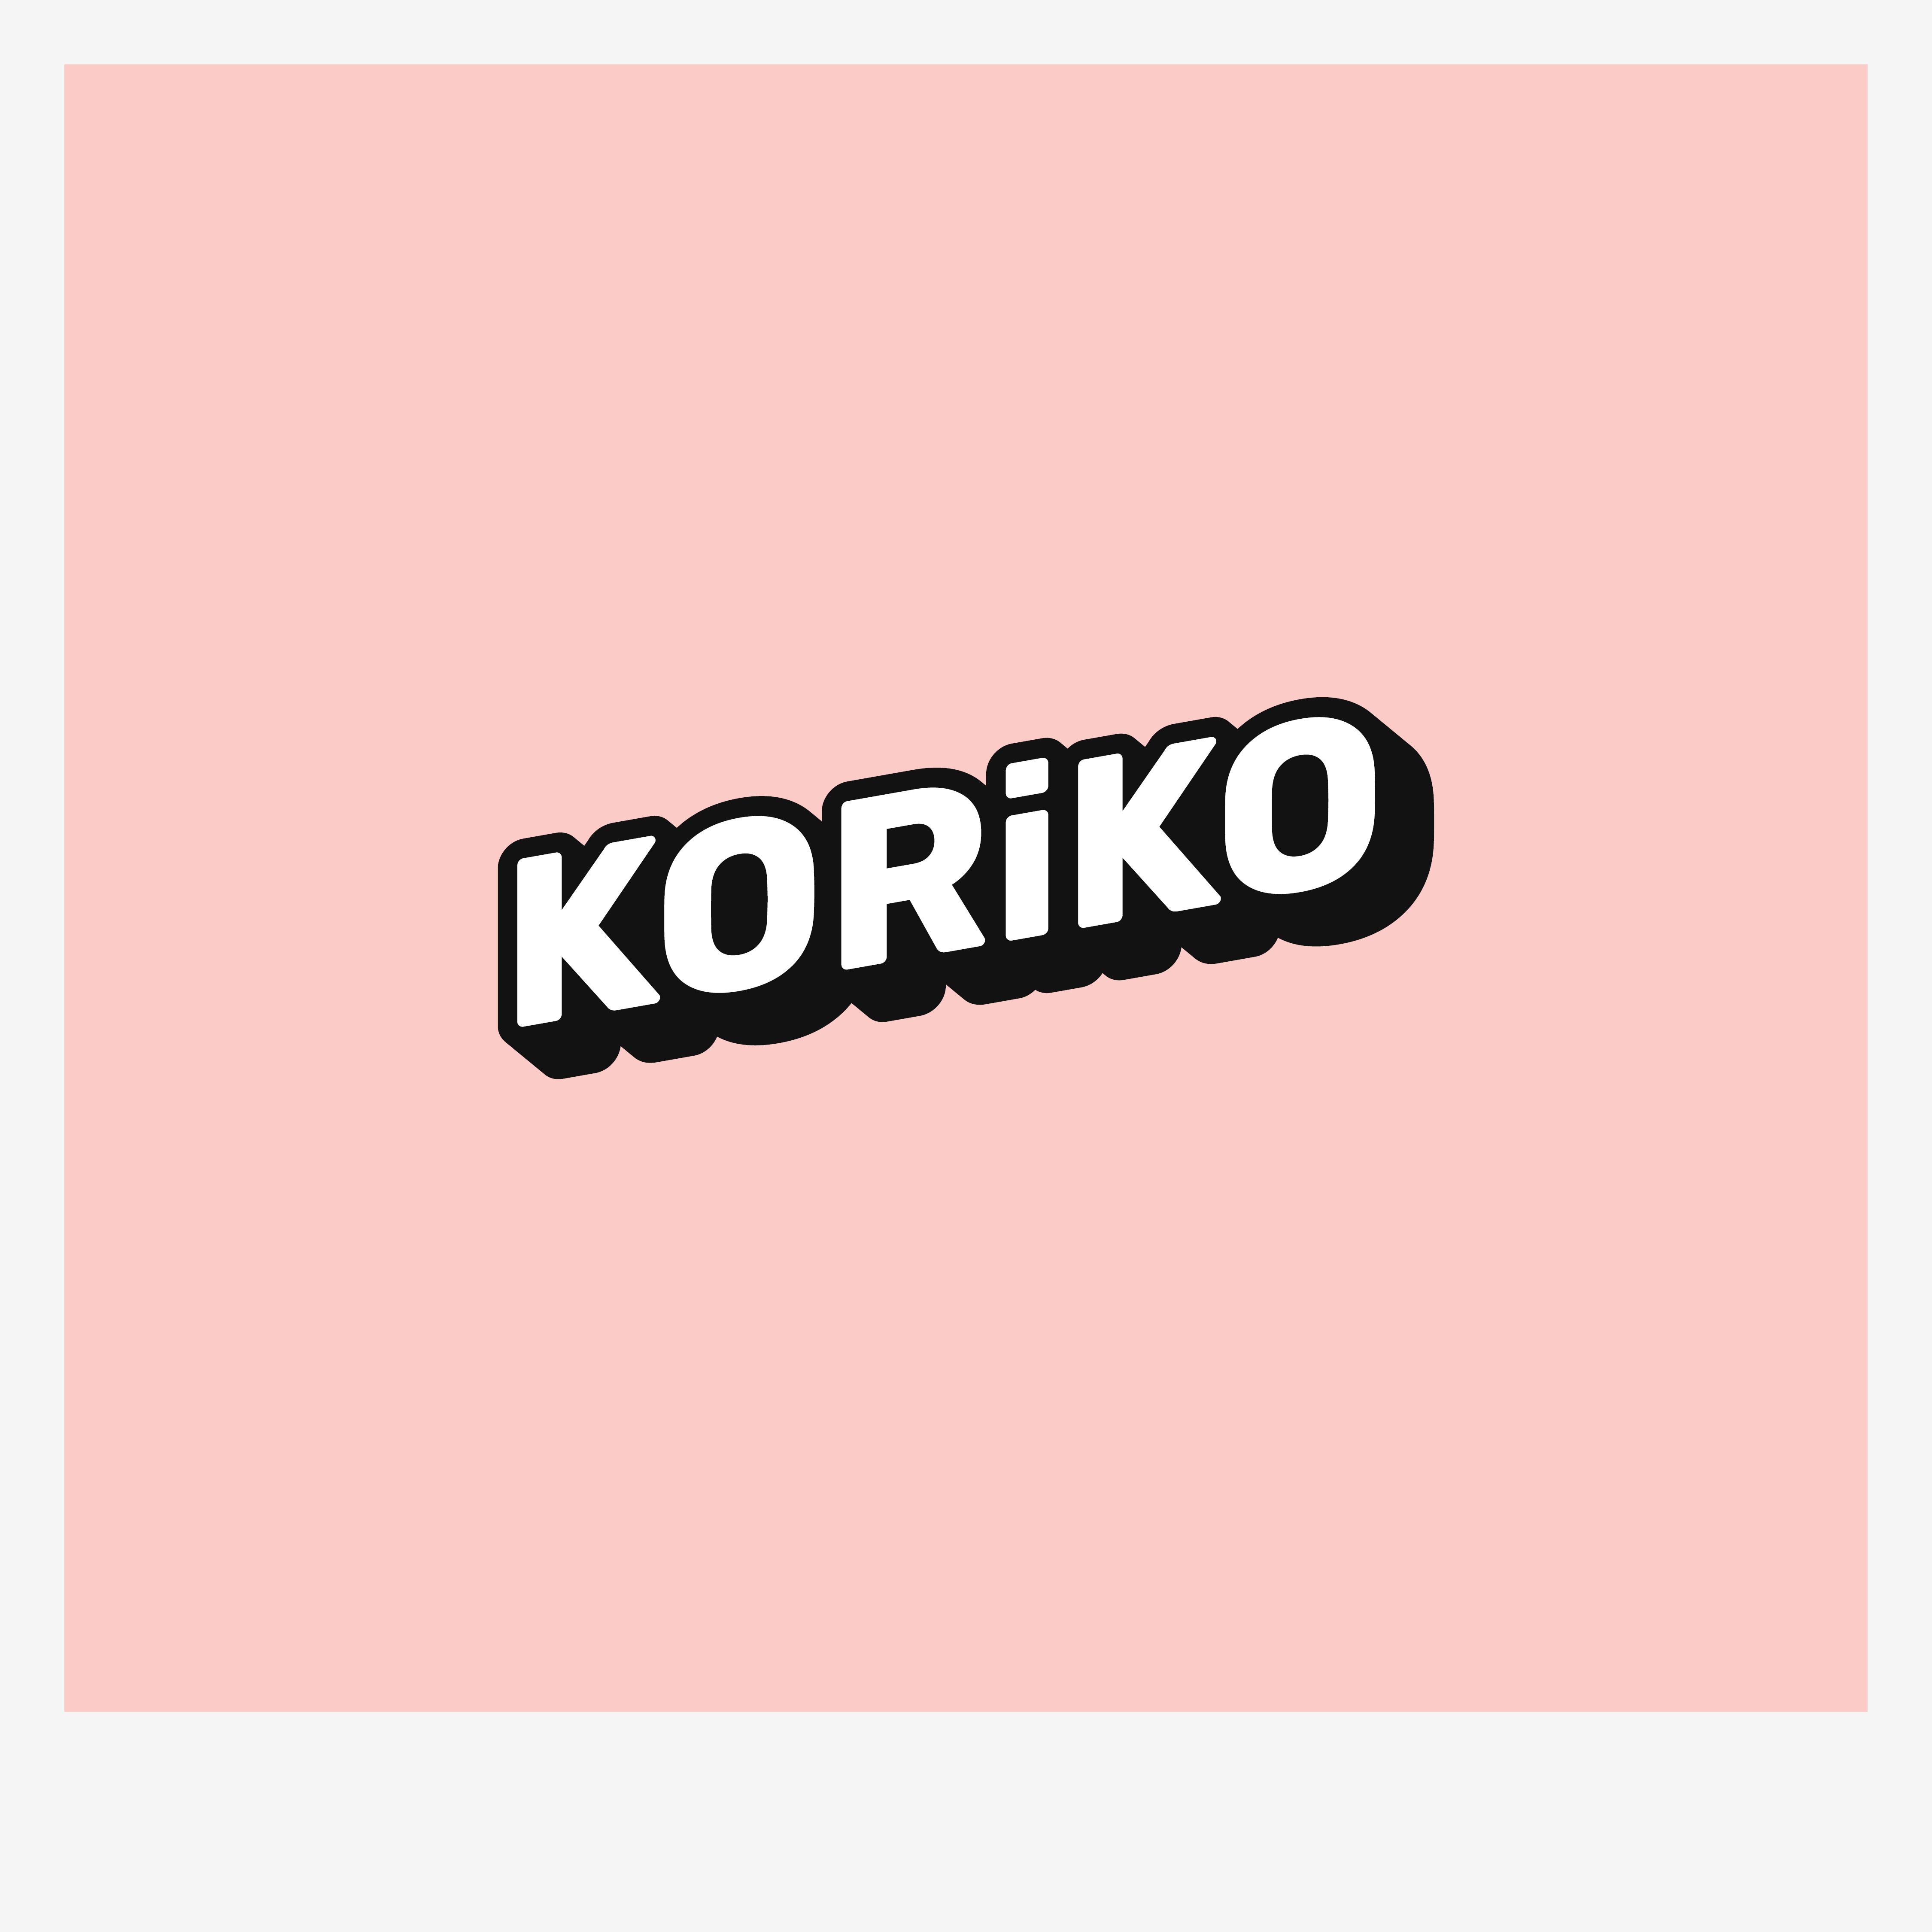 Koriko's primary logo